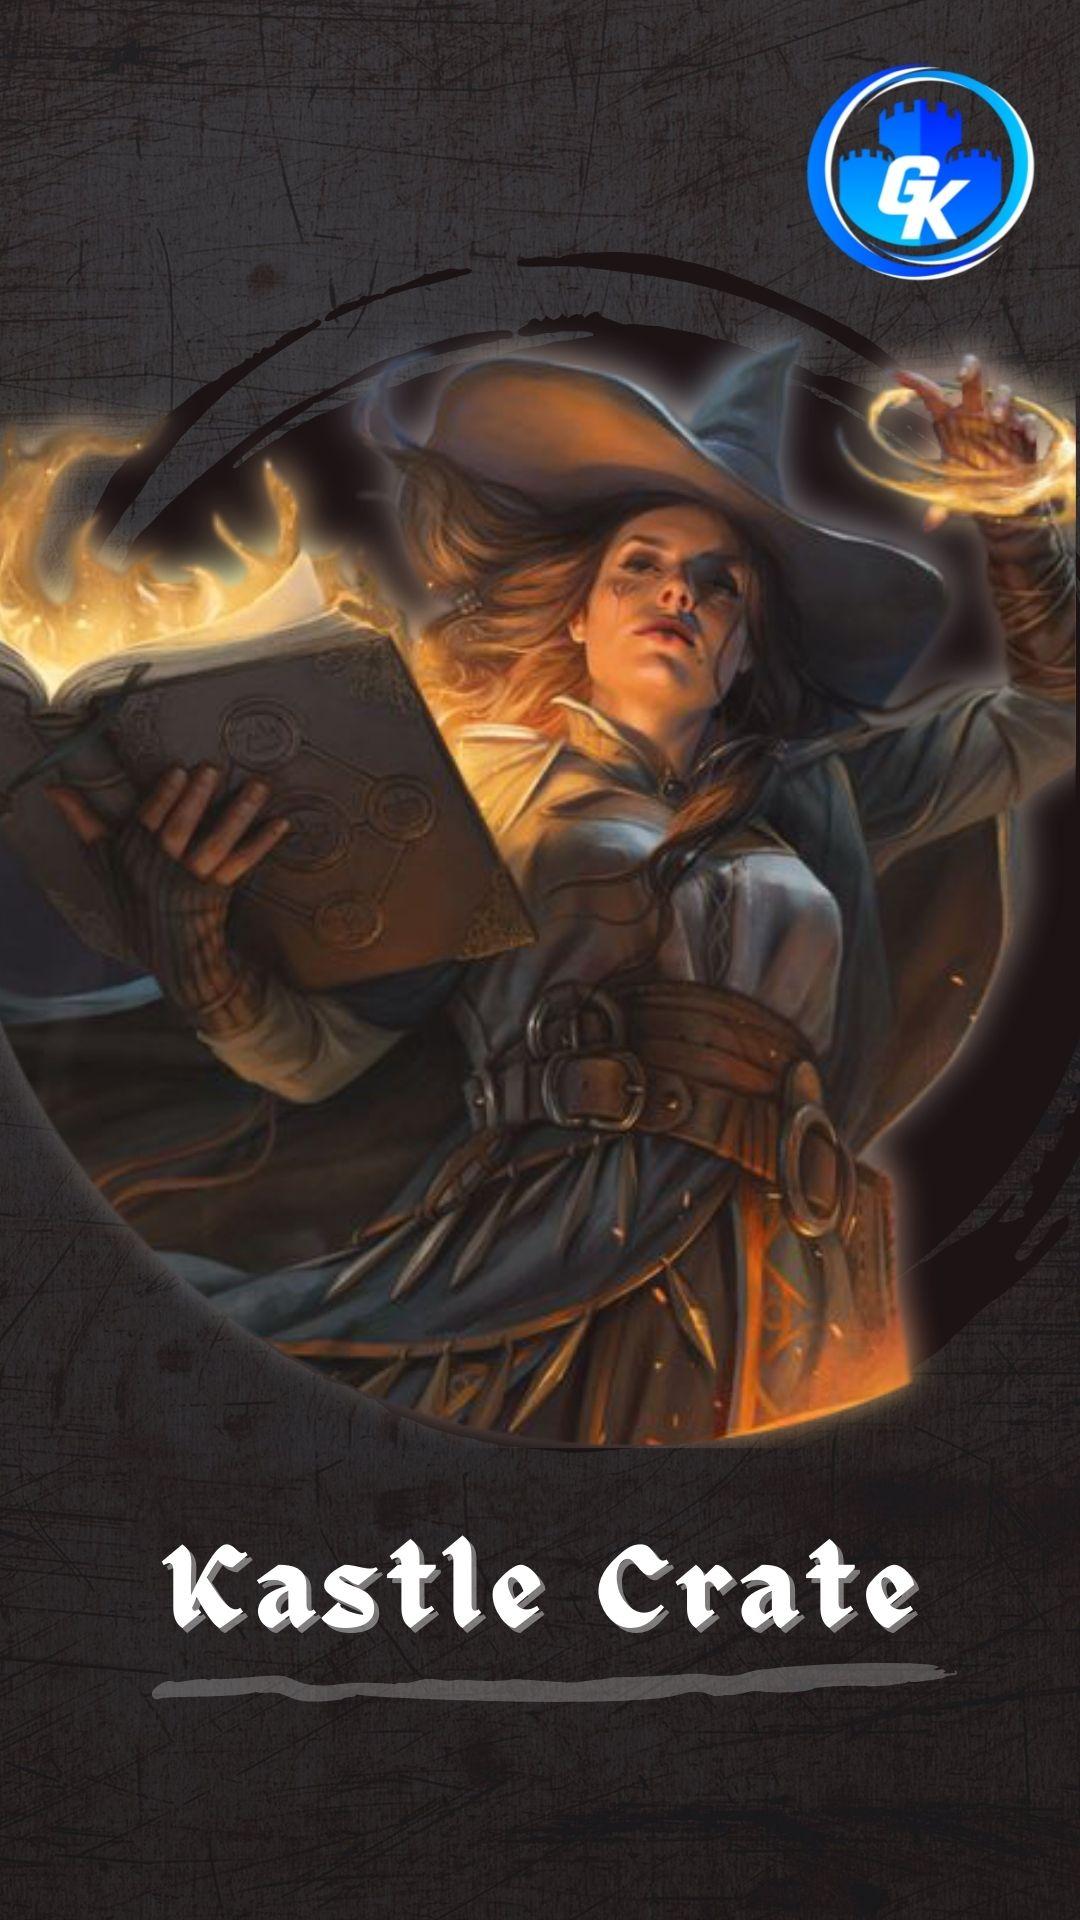 https://www.gamekastle.com/online/images/uploads/Crate_WitchMo.jpg